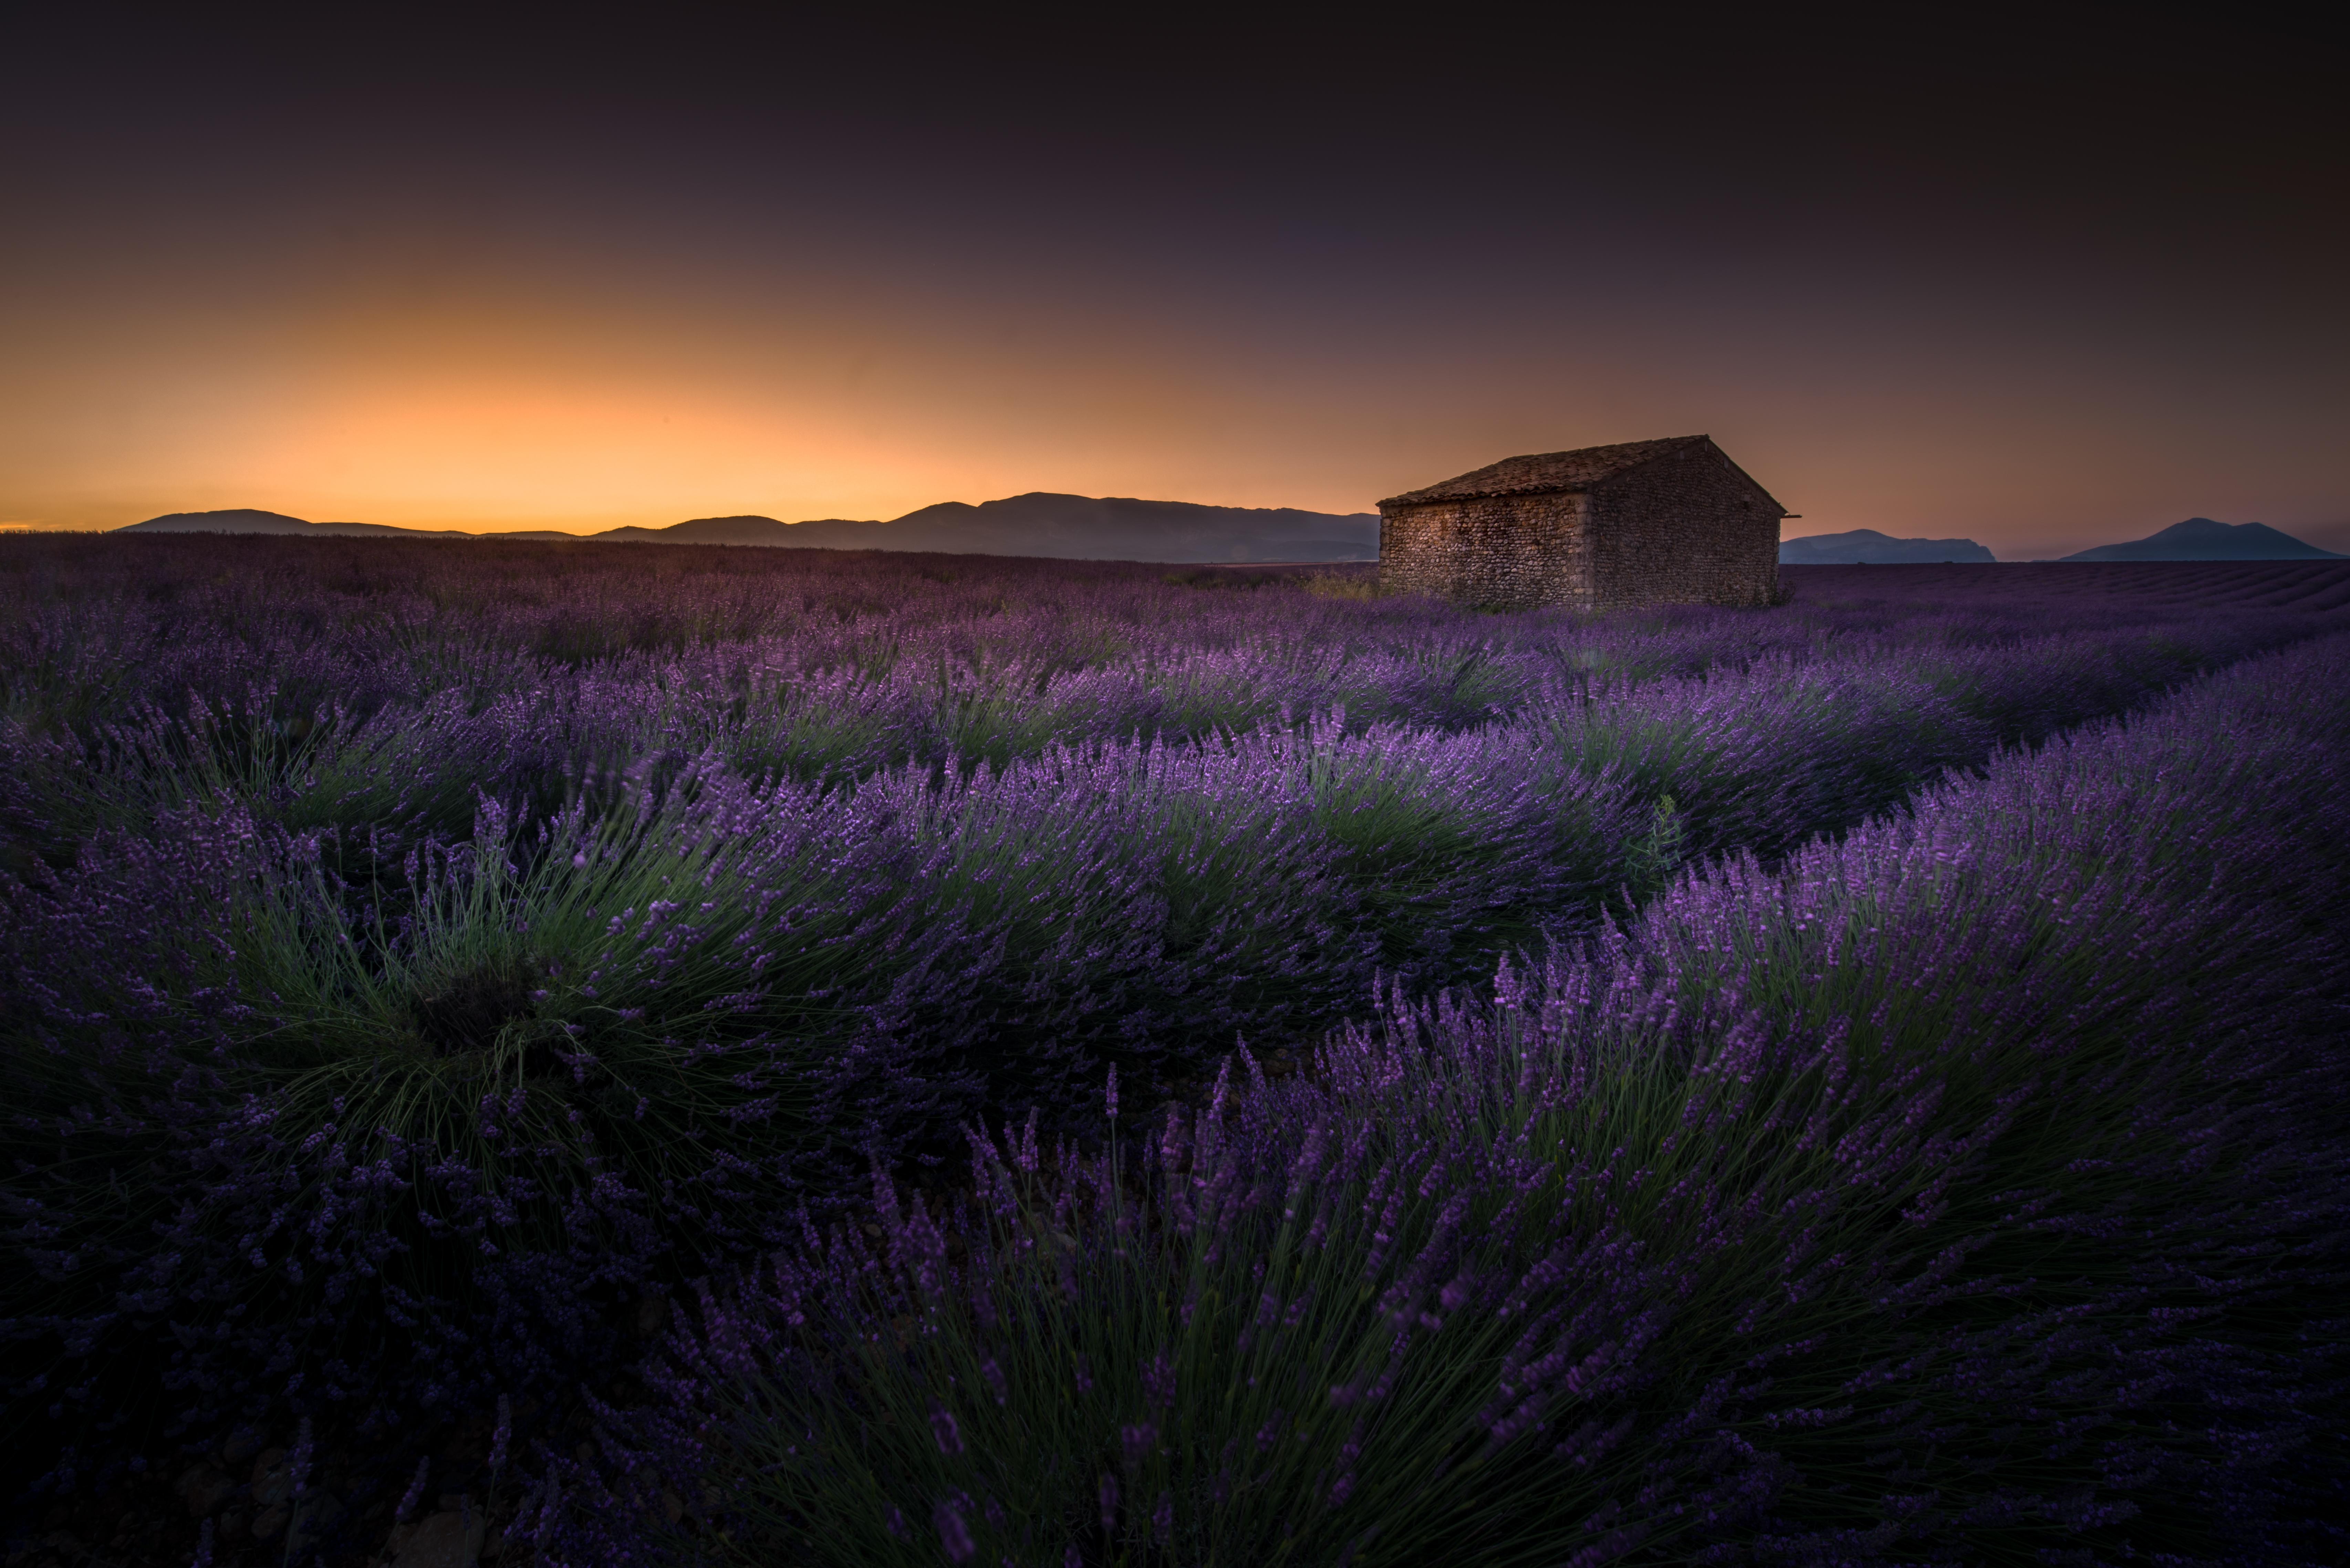 2- Provence